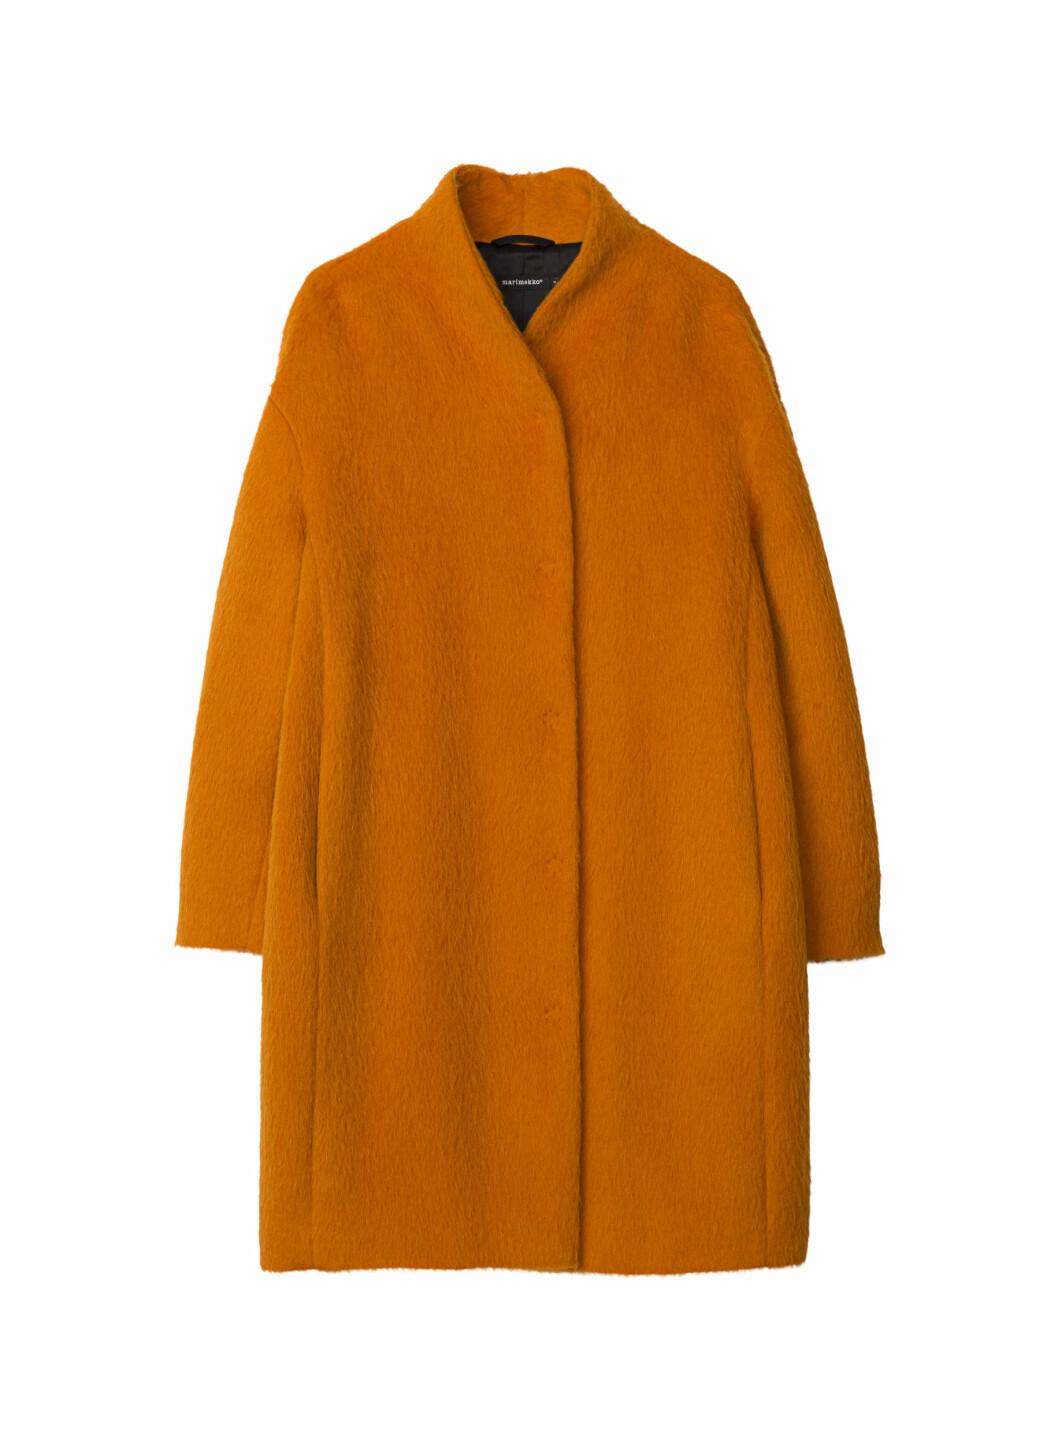 Oransje fra Marimekko, kr 4995 Foto: Produsentene